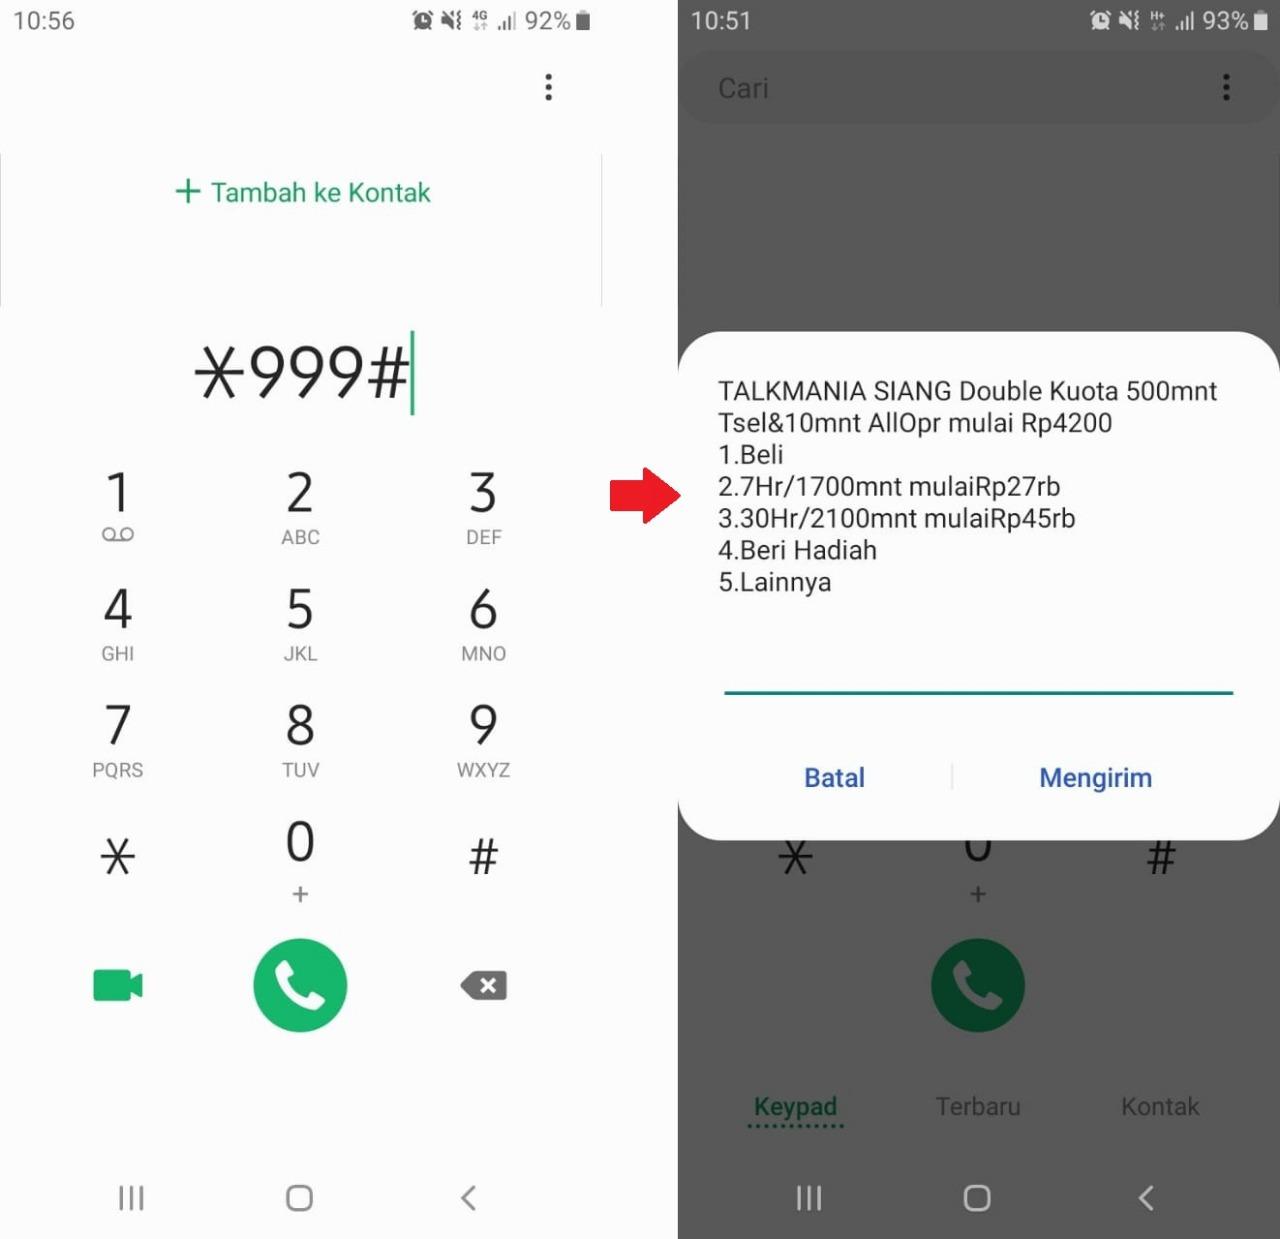 Cara Beli Paket Nelpon Telkomsel Termurah 200 Menit Rp 1000 Paket Internet